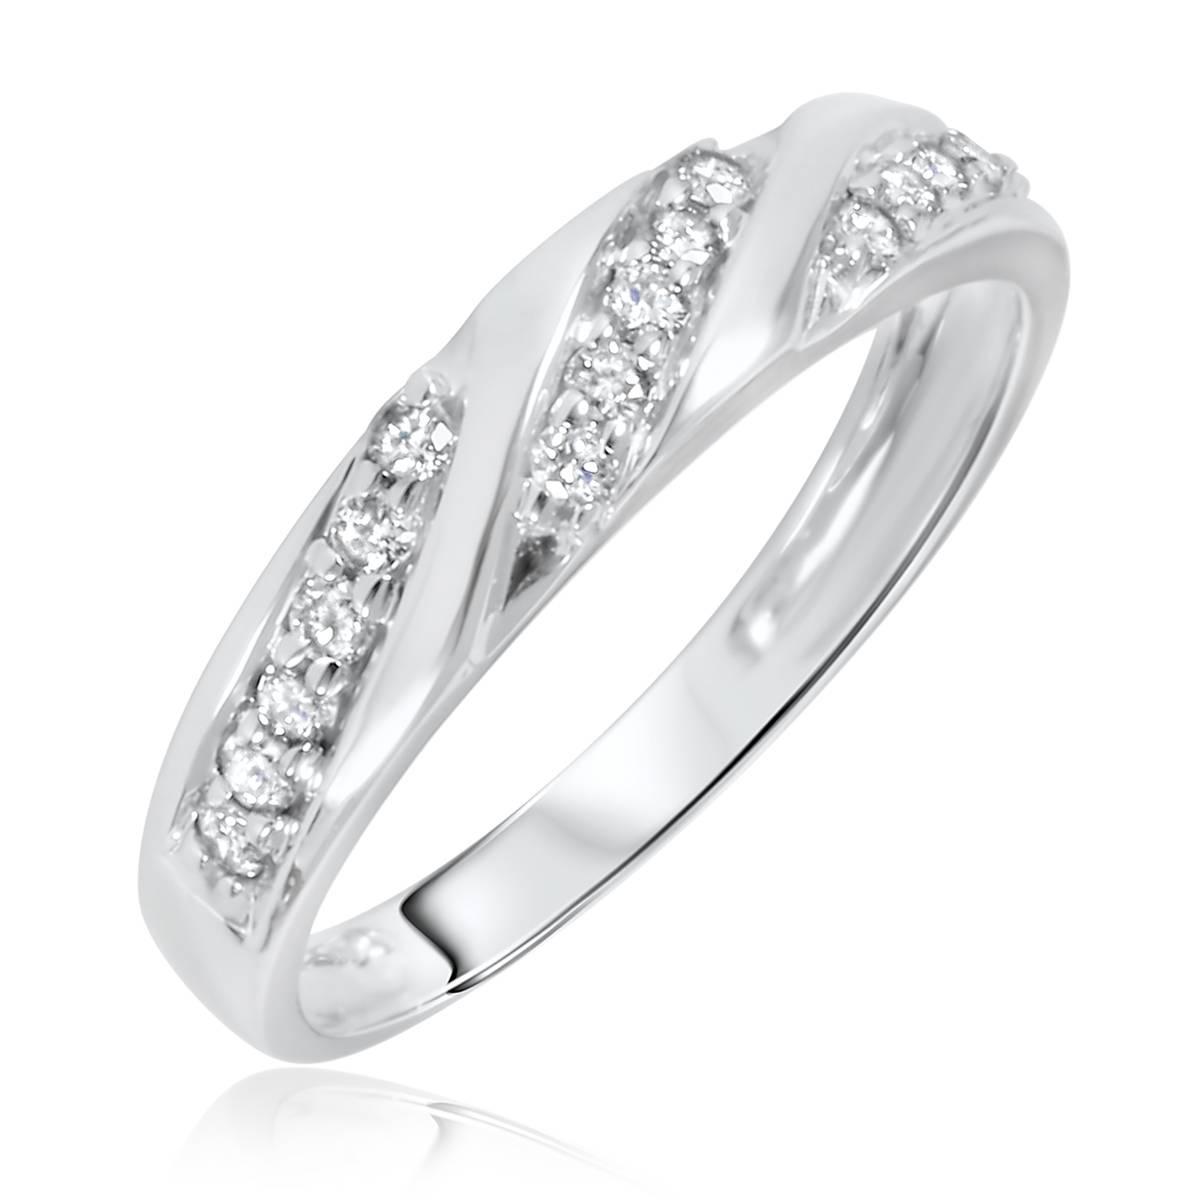 1 1/2 Ct. T.w. Diamond Women's Bridal Wedding Ring Set 10K White Gold Regarding Ladies White Gold Diamond Wedding Bands (Gallery 6 of 15)